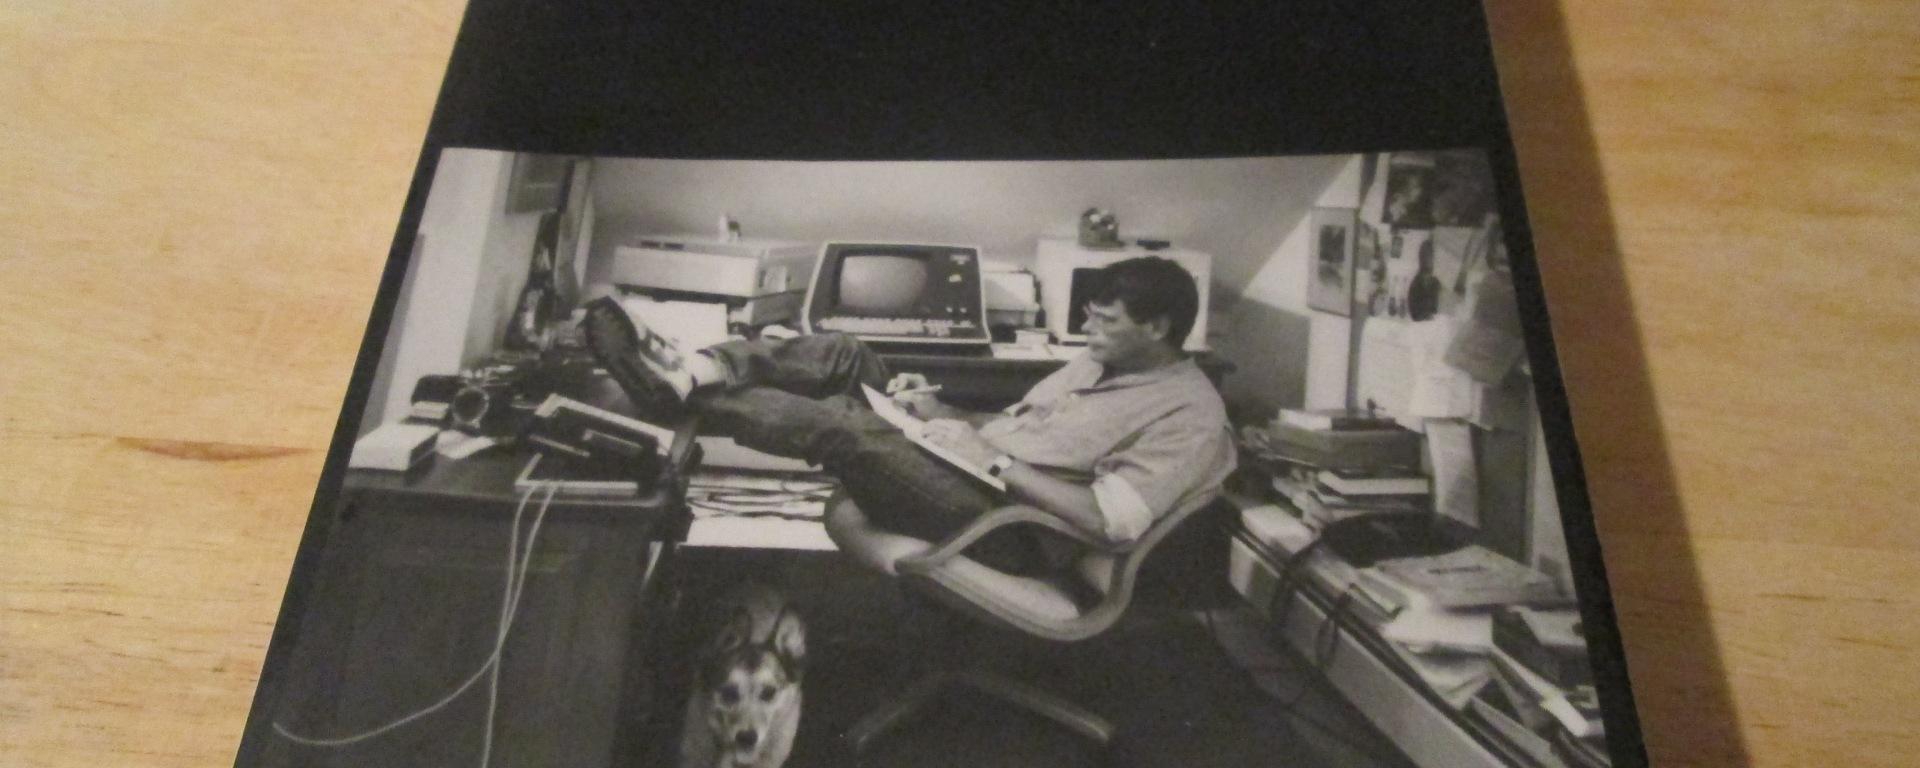 Stephen King, On Writing, Memoir